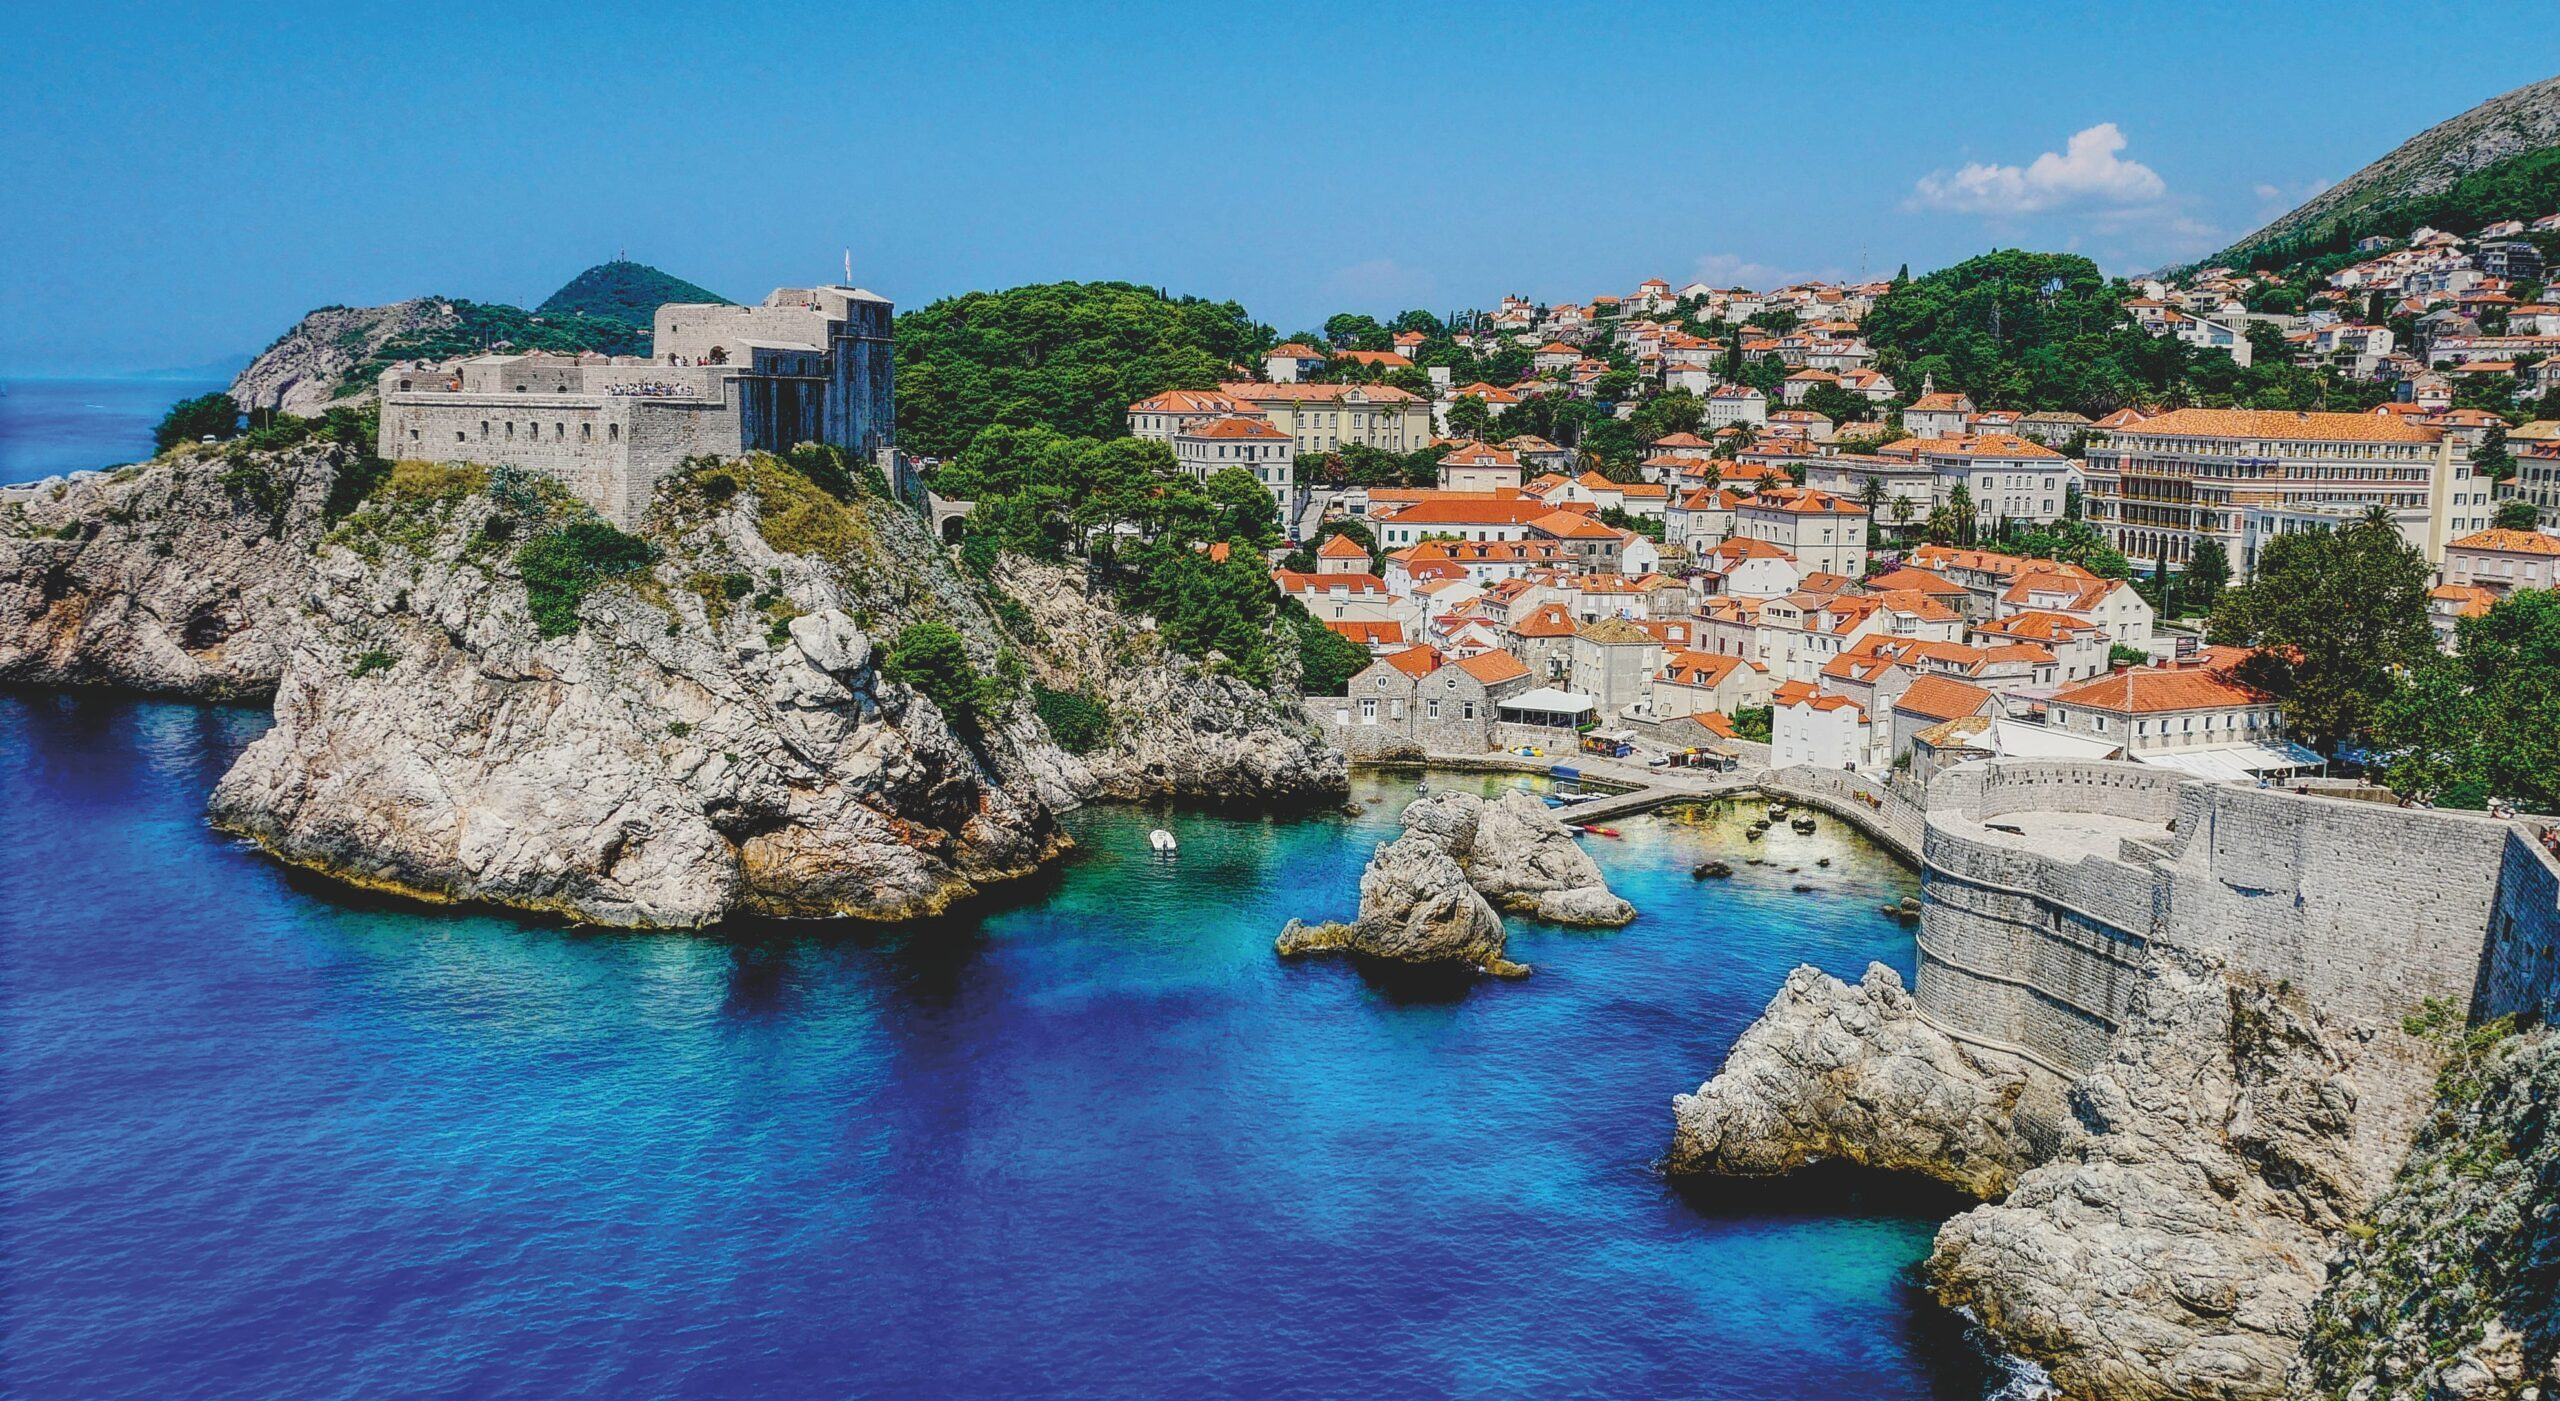 Stunning Dubrovnik, 6 Day Split, Dubrovnik & Plitvice Lakes Tour Package